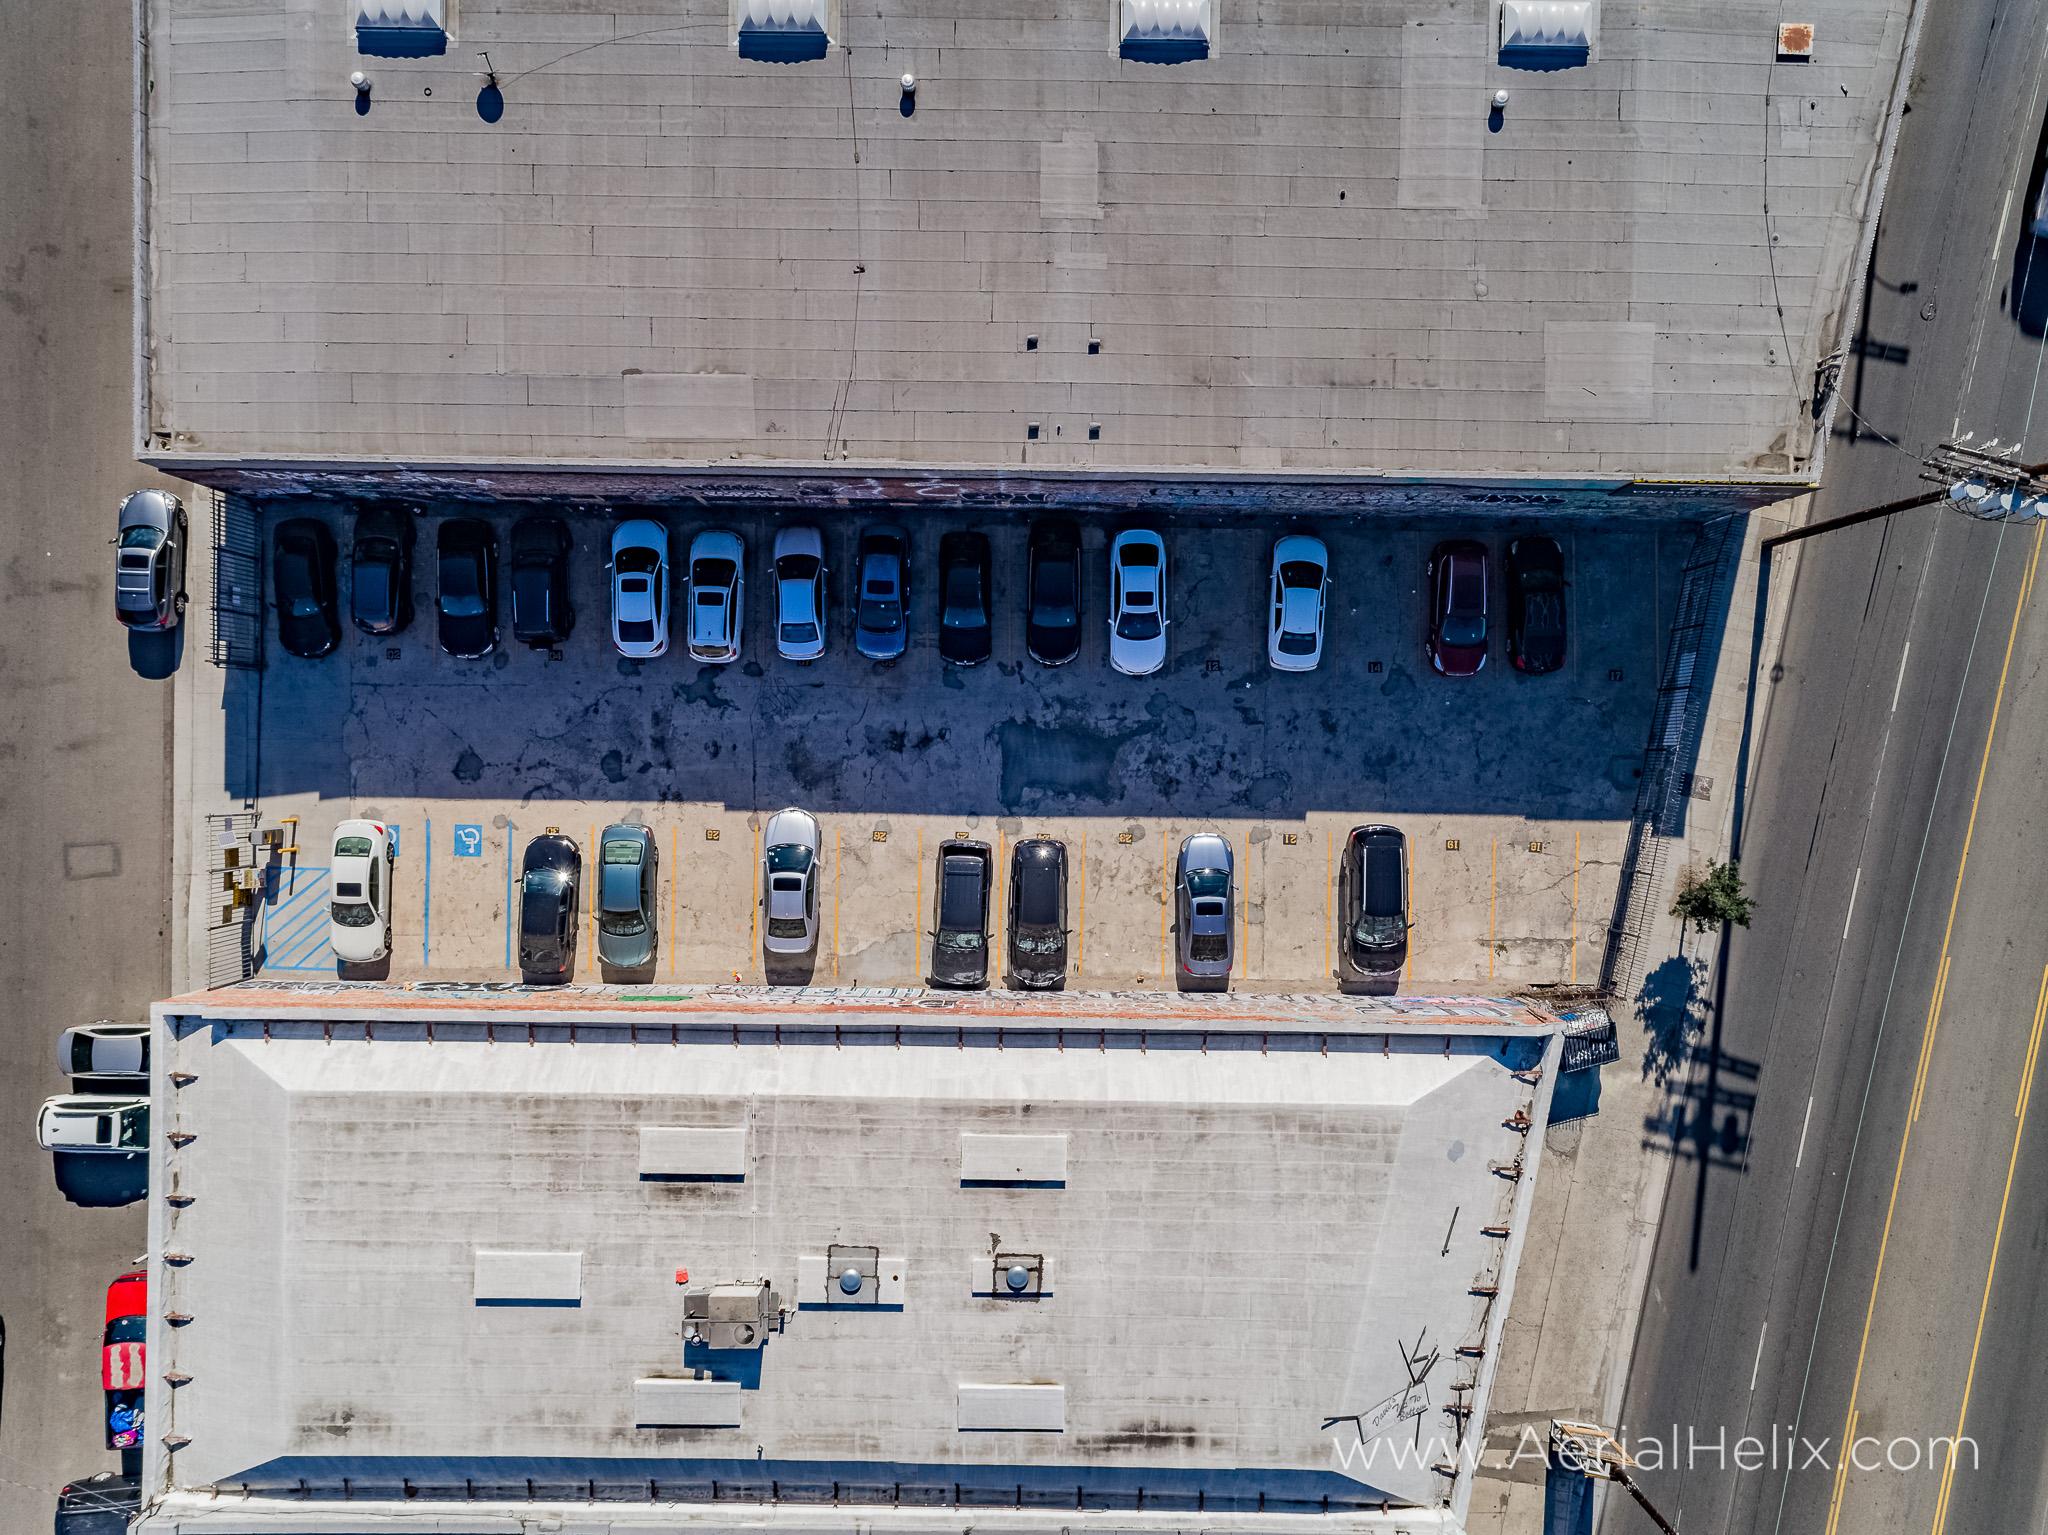 Perfect Parking 2 aerial photographer-12.jpg